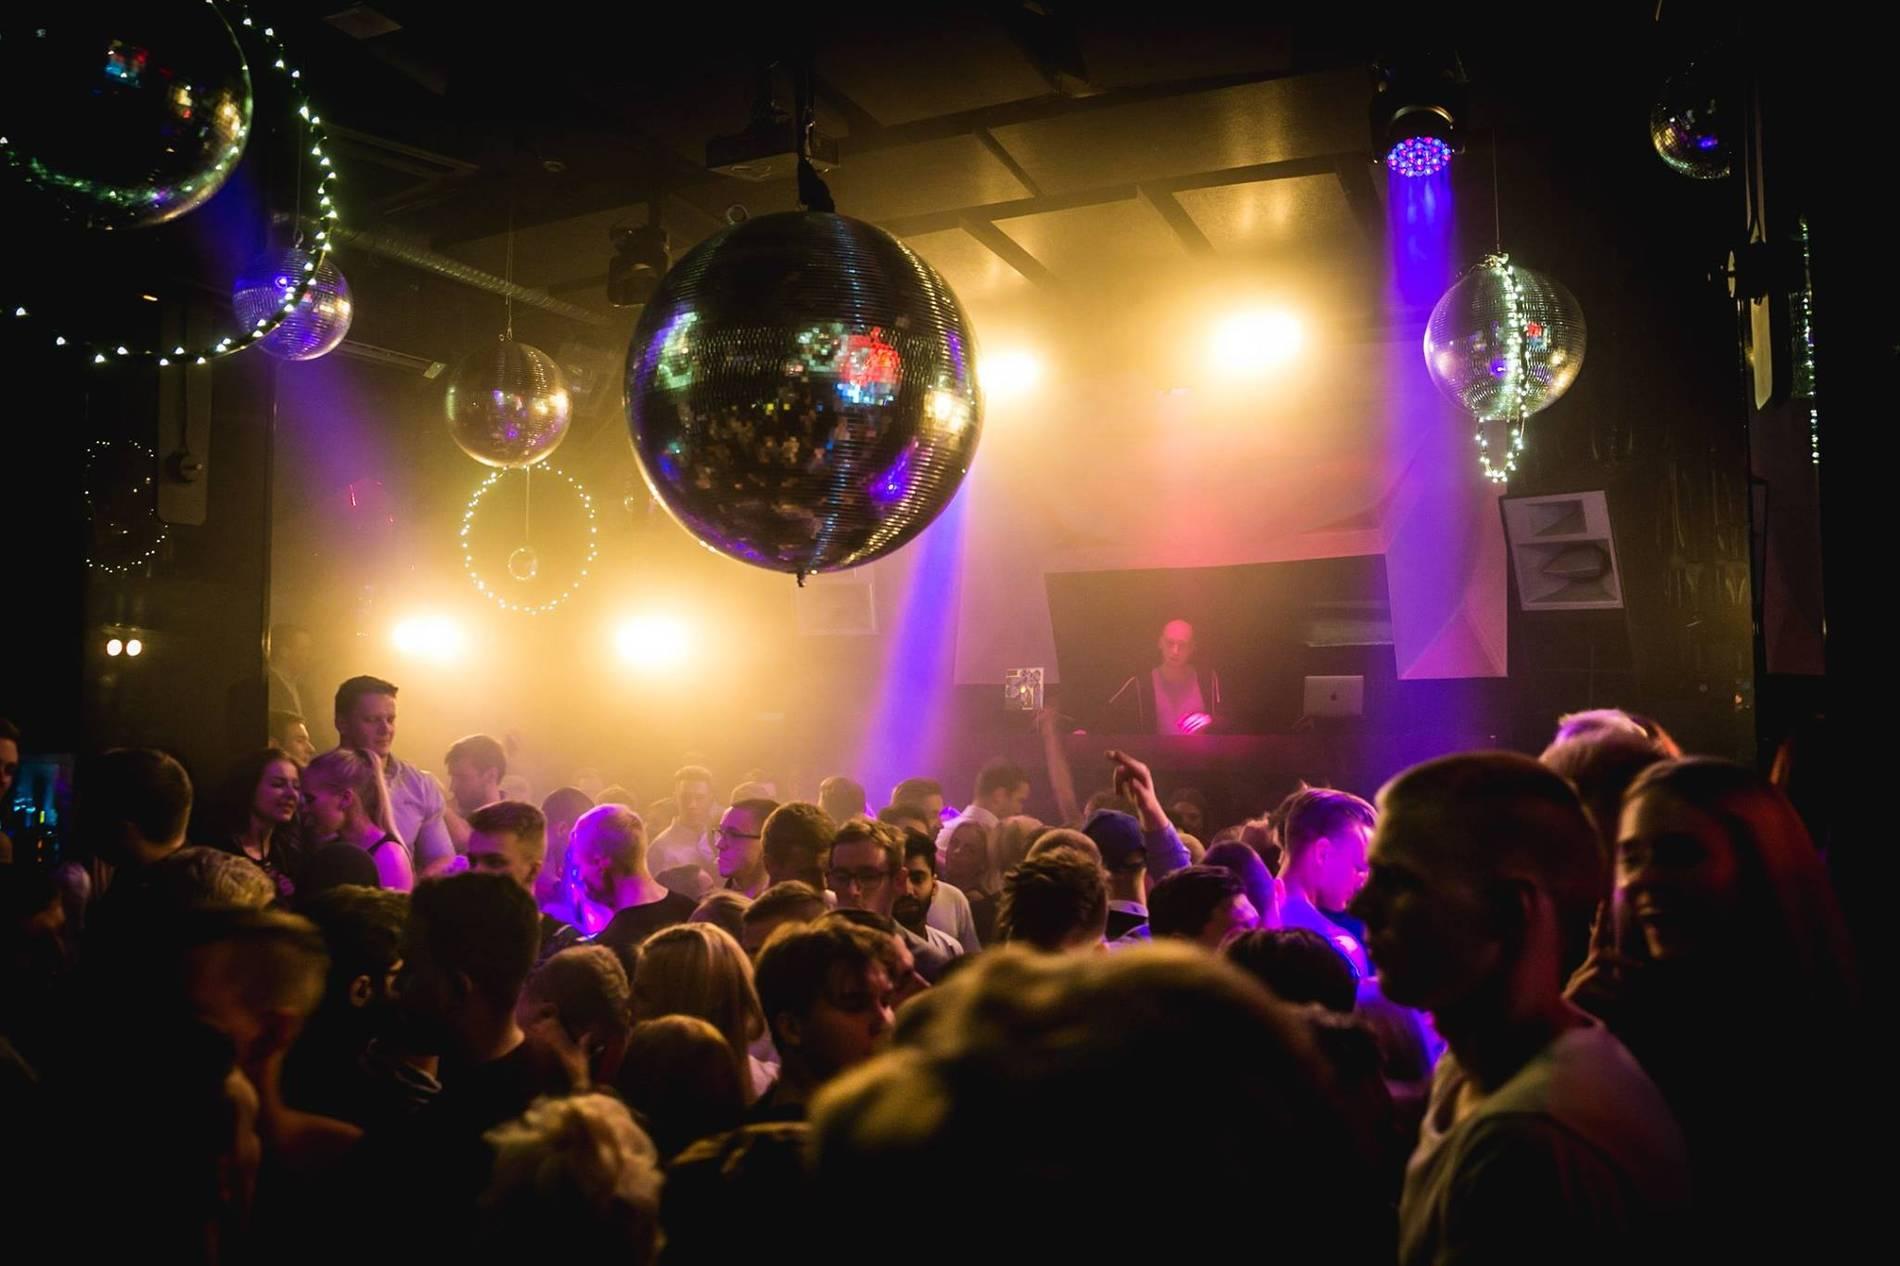 Nightclub event in the Club Studio in Tallinn, Estonia.